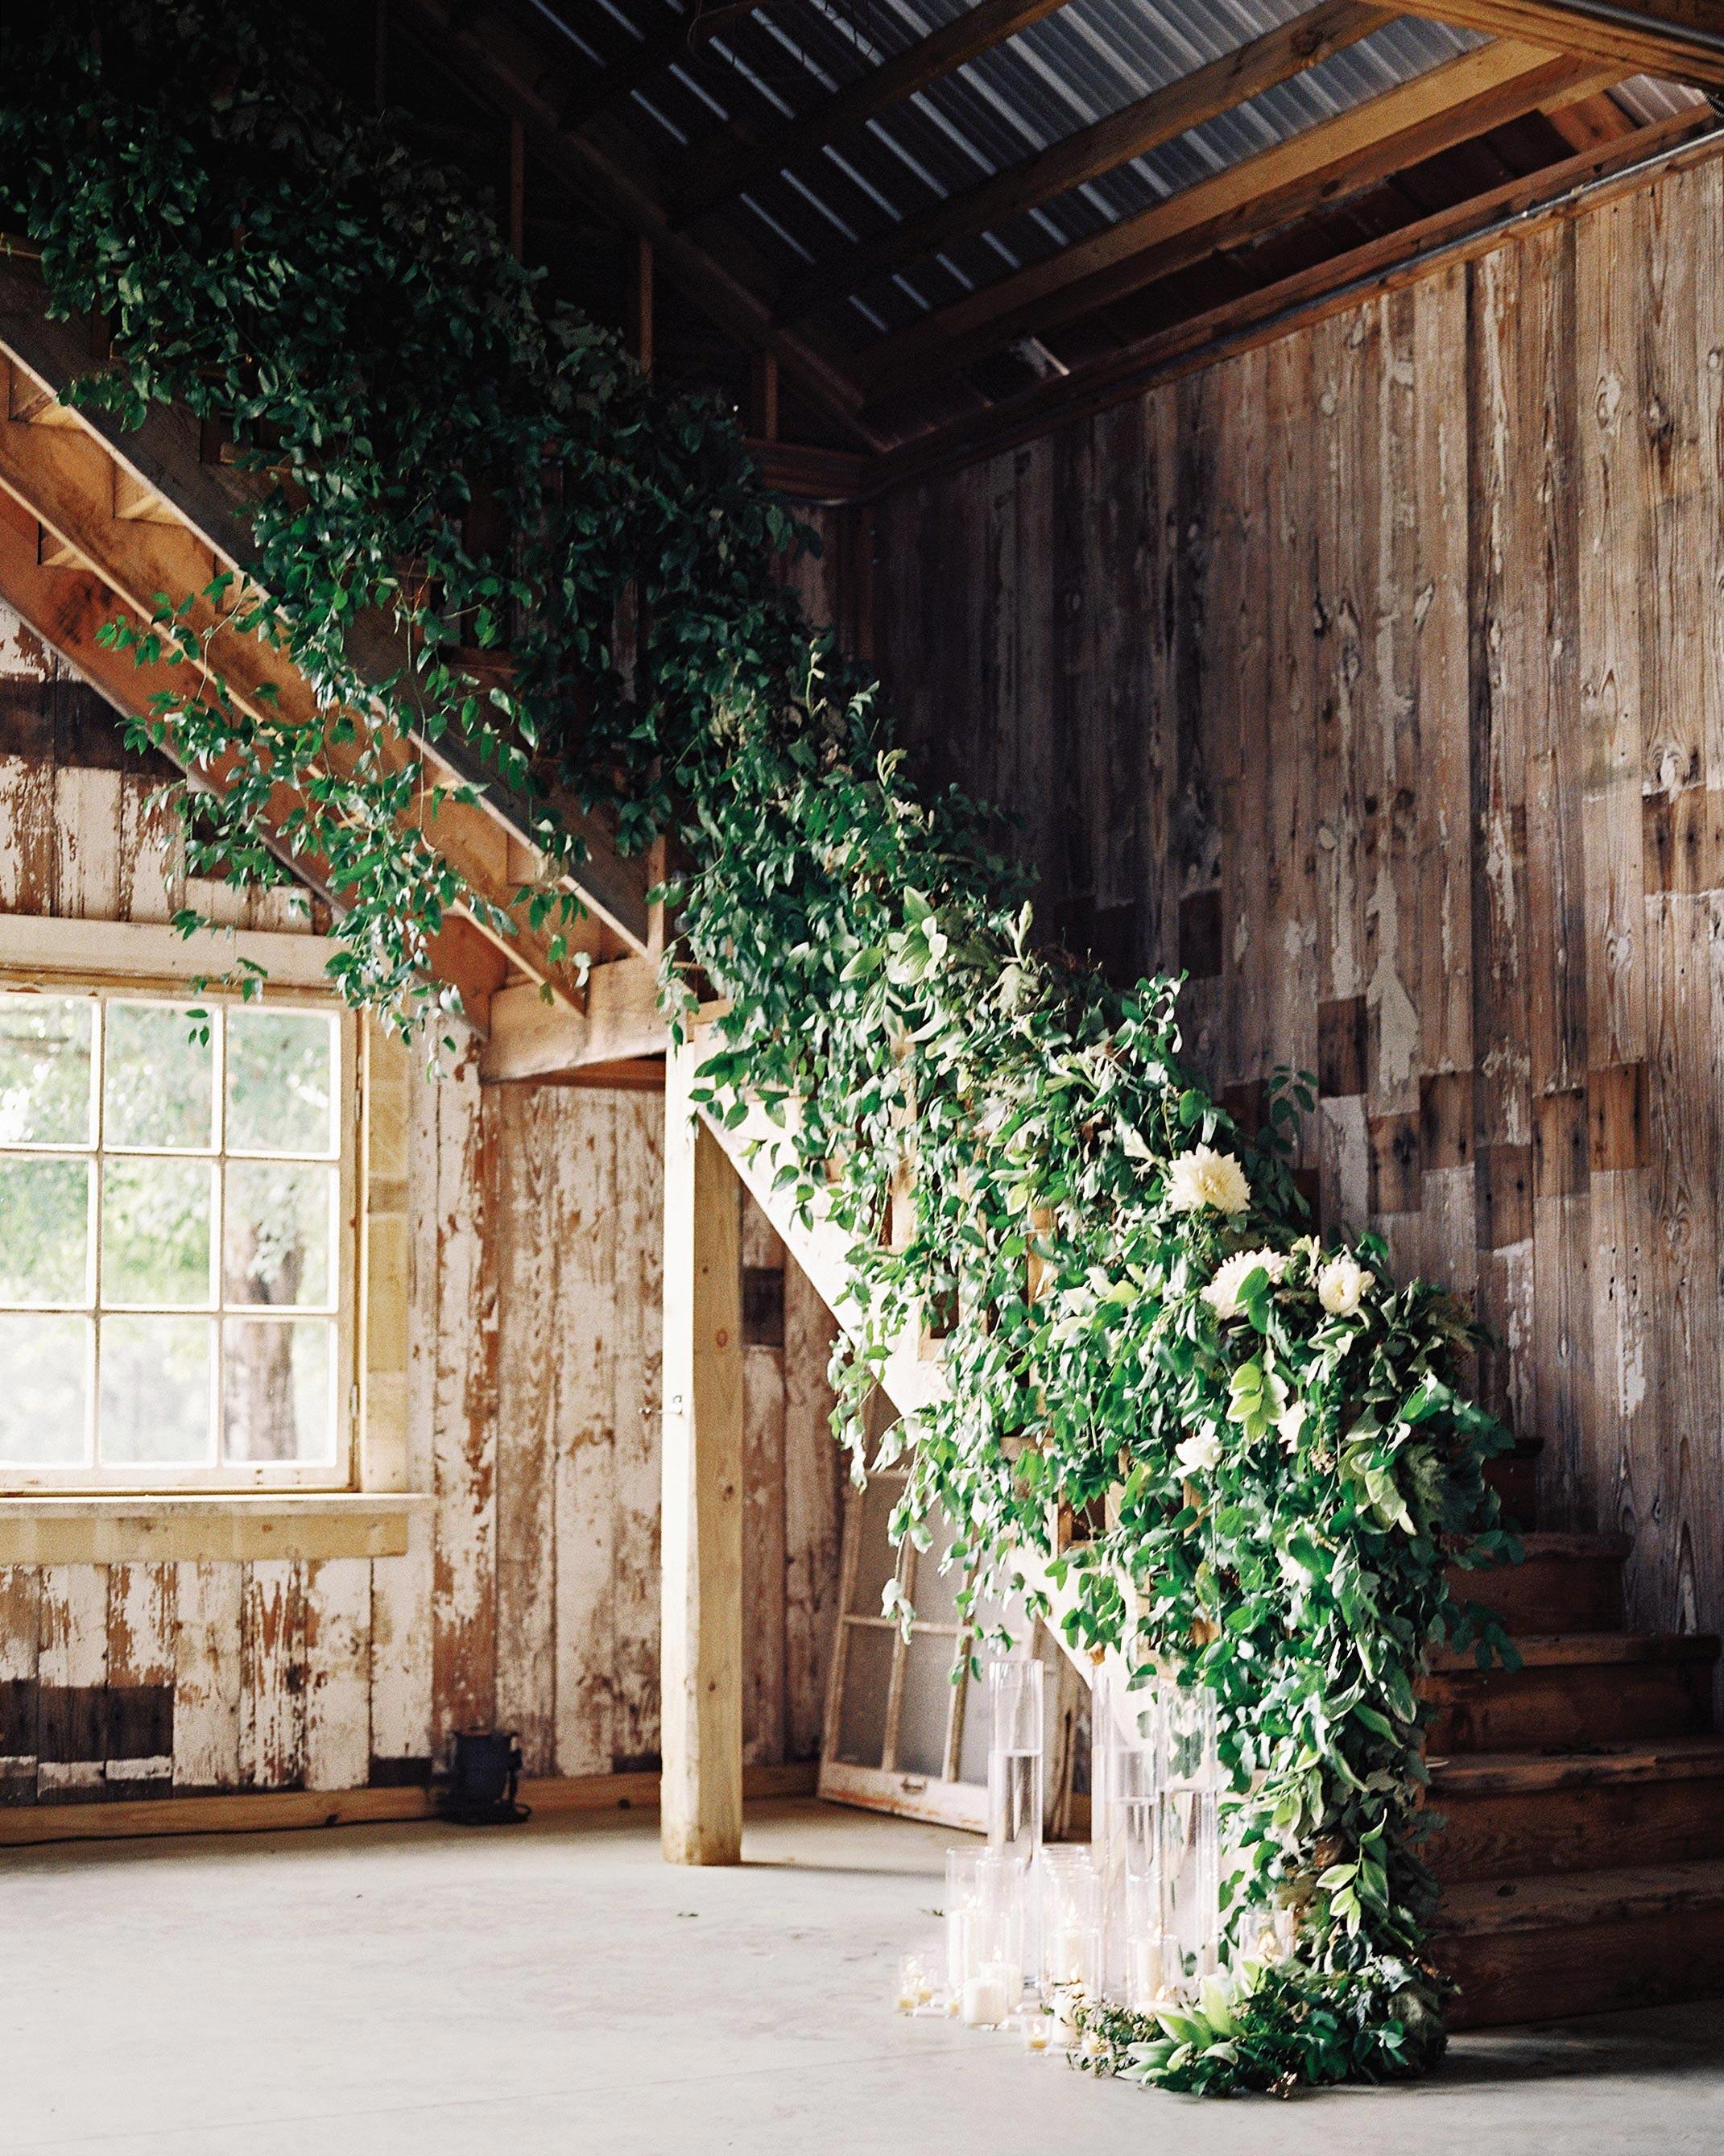 stephanie-mike-wedding-north-carolina-barn-staircase-floral-garland-11-s112048.jpg